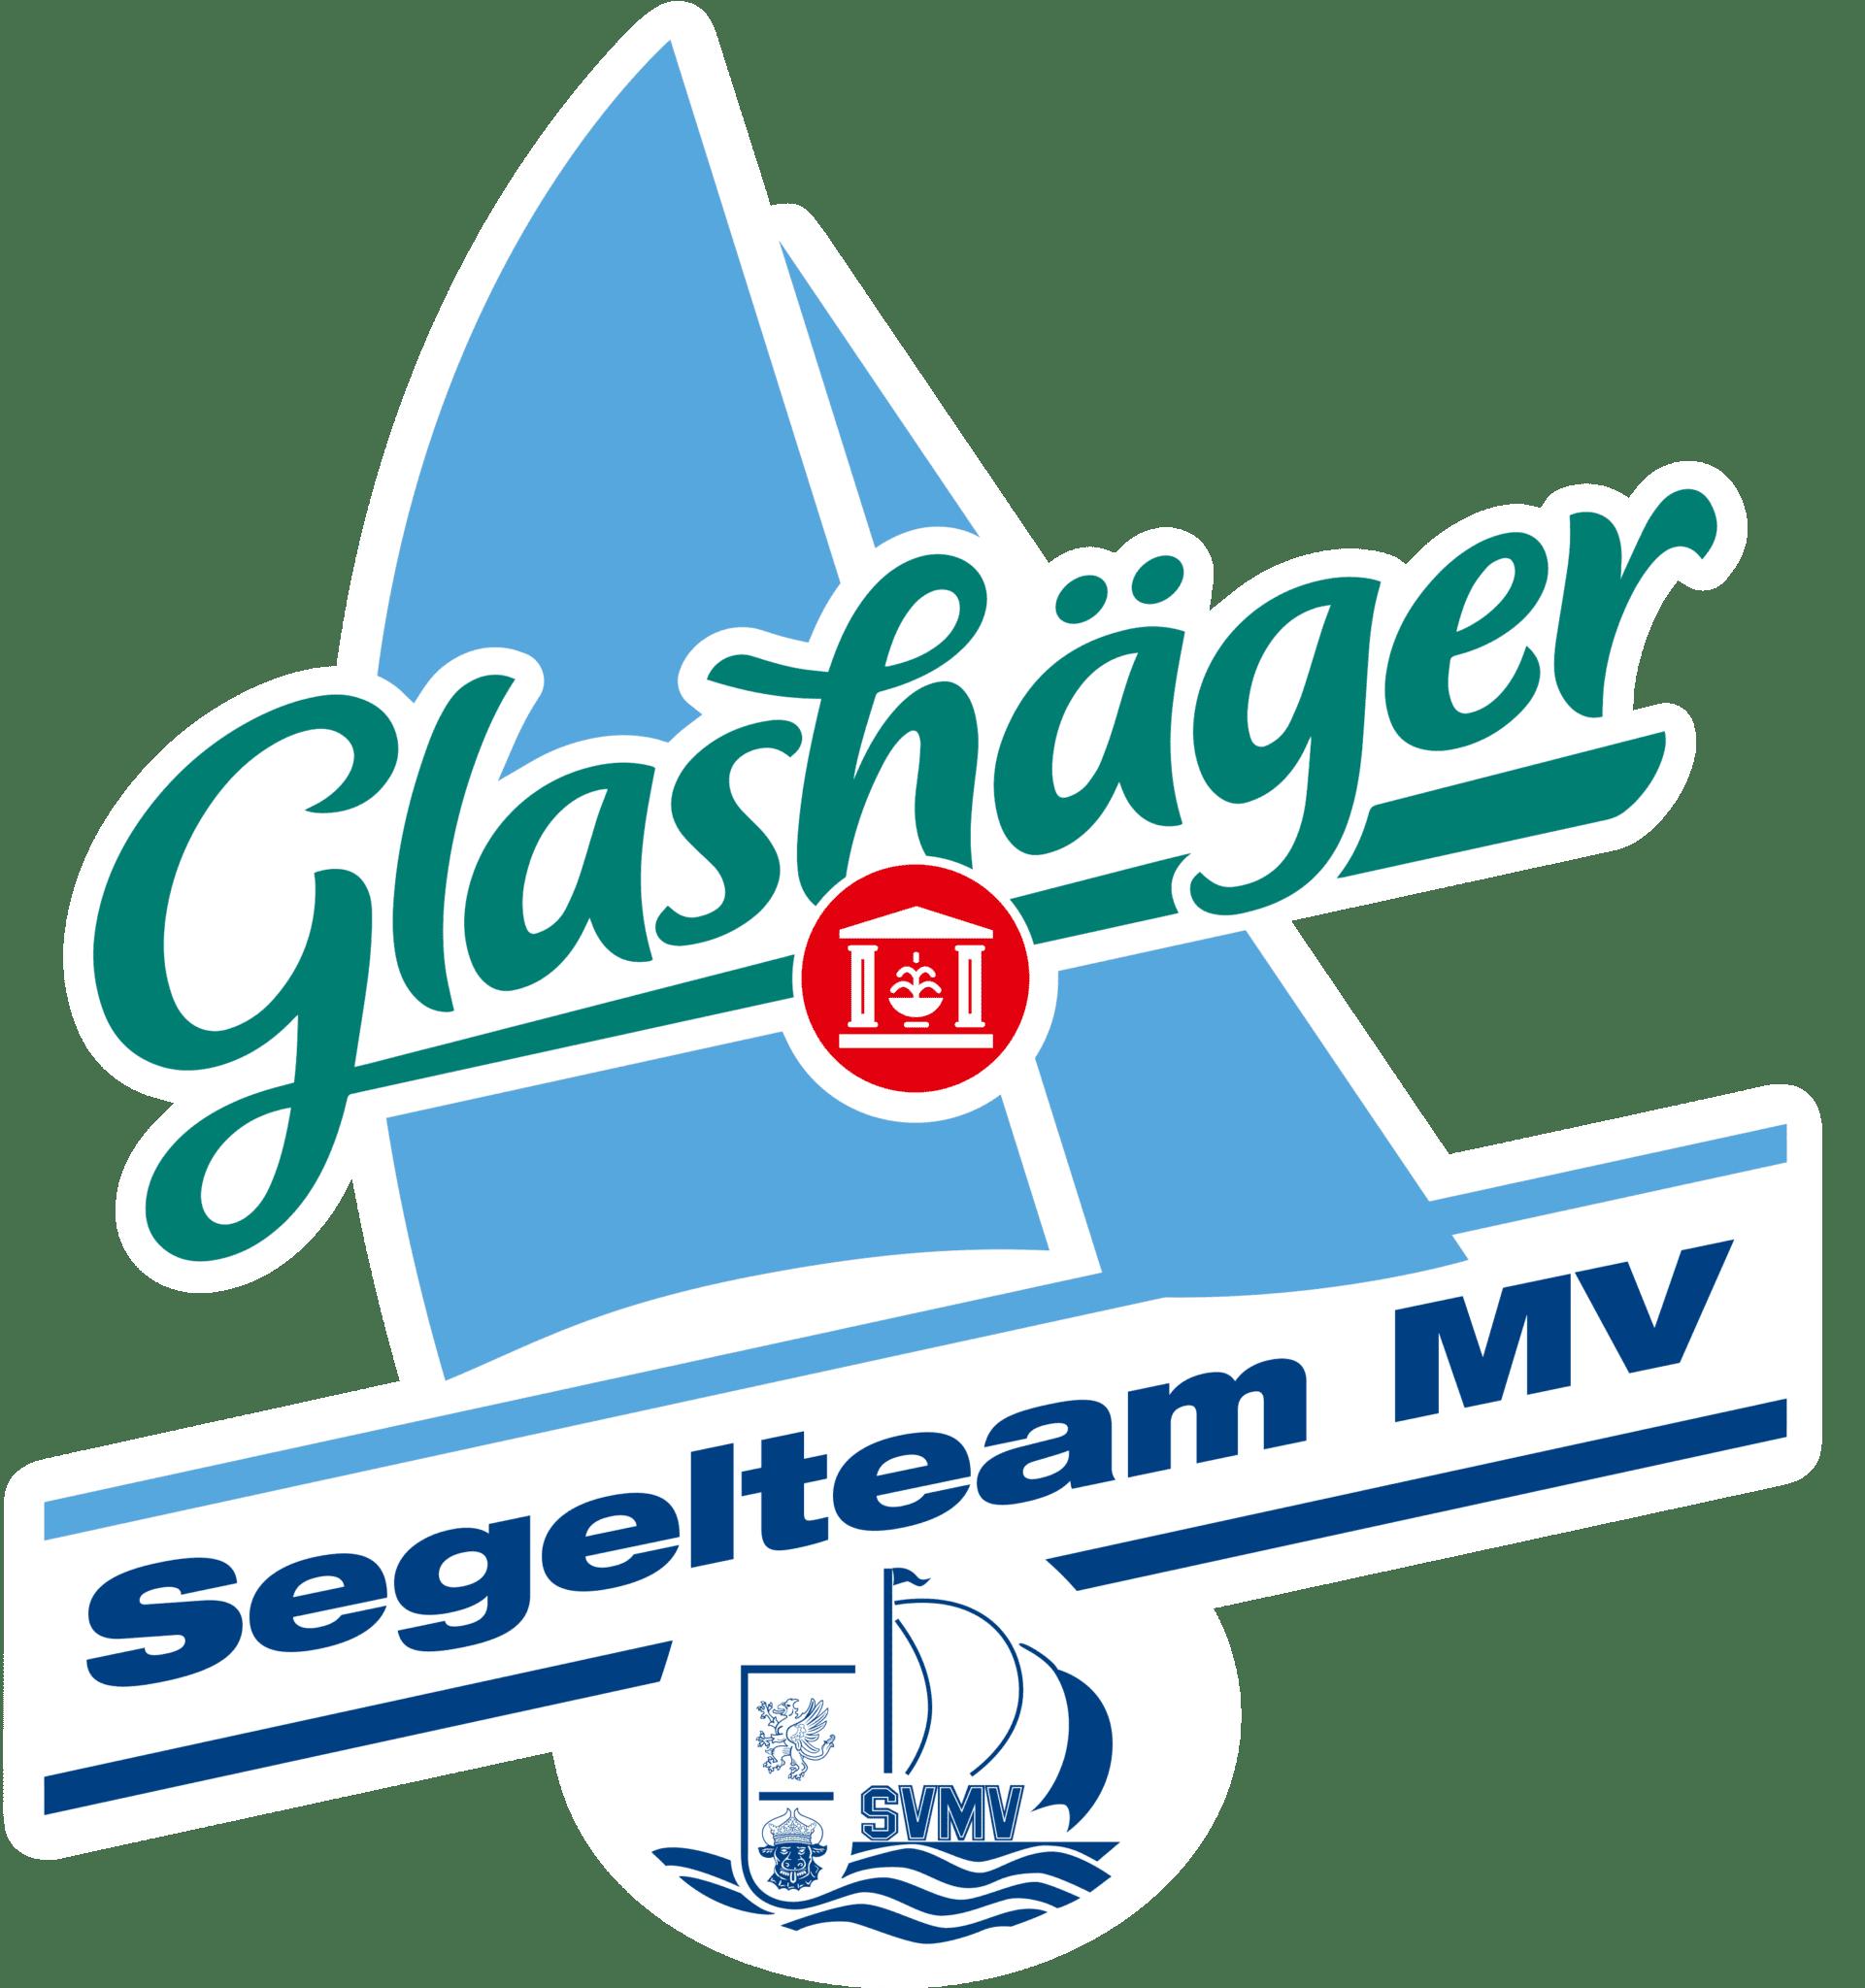 GLASHAEG_Logo_Segelteam_farbig